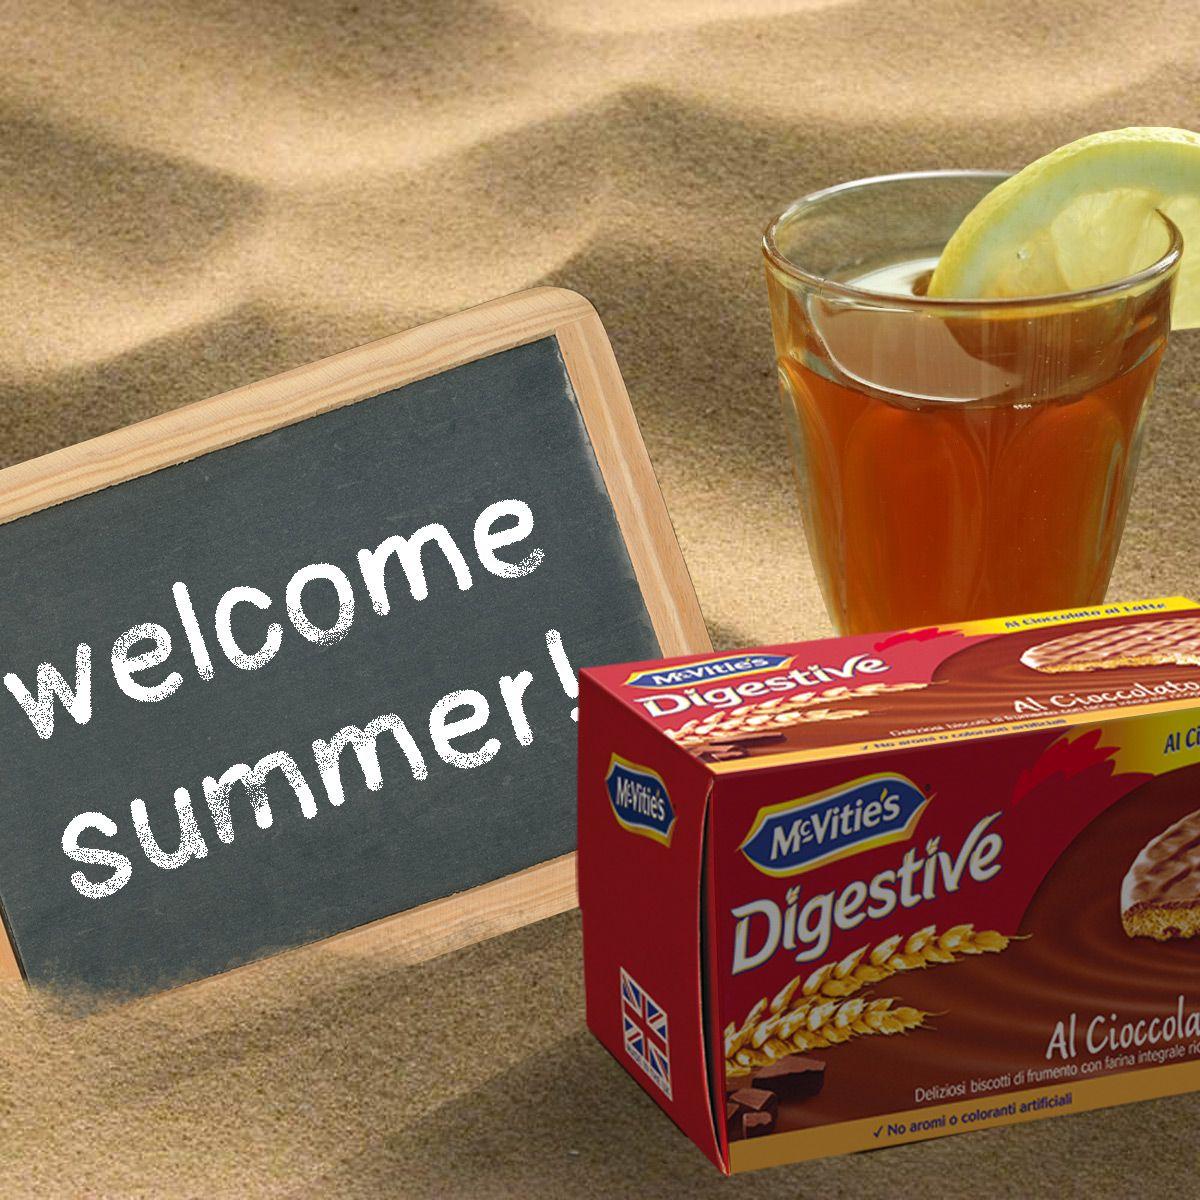 #mcvitiesitalia #mcvitiesdigestive #mcvitiescioccolatoallatte #mcvities #summer #estate #thèfreddo #spiaggia #sabbia #lavagnetta #gesso #relax #food #cibo #sweet #dolce #biscuits #biscotti